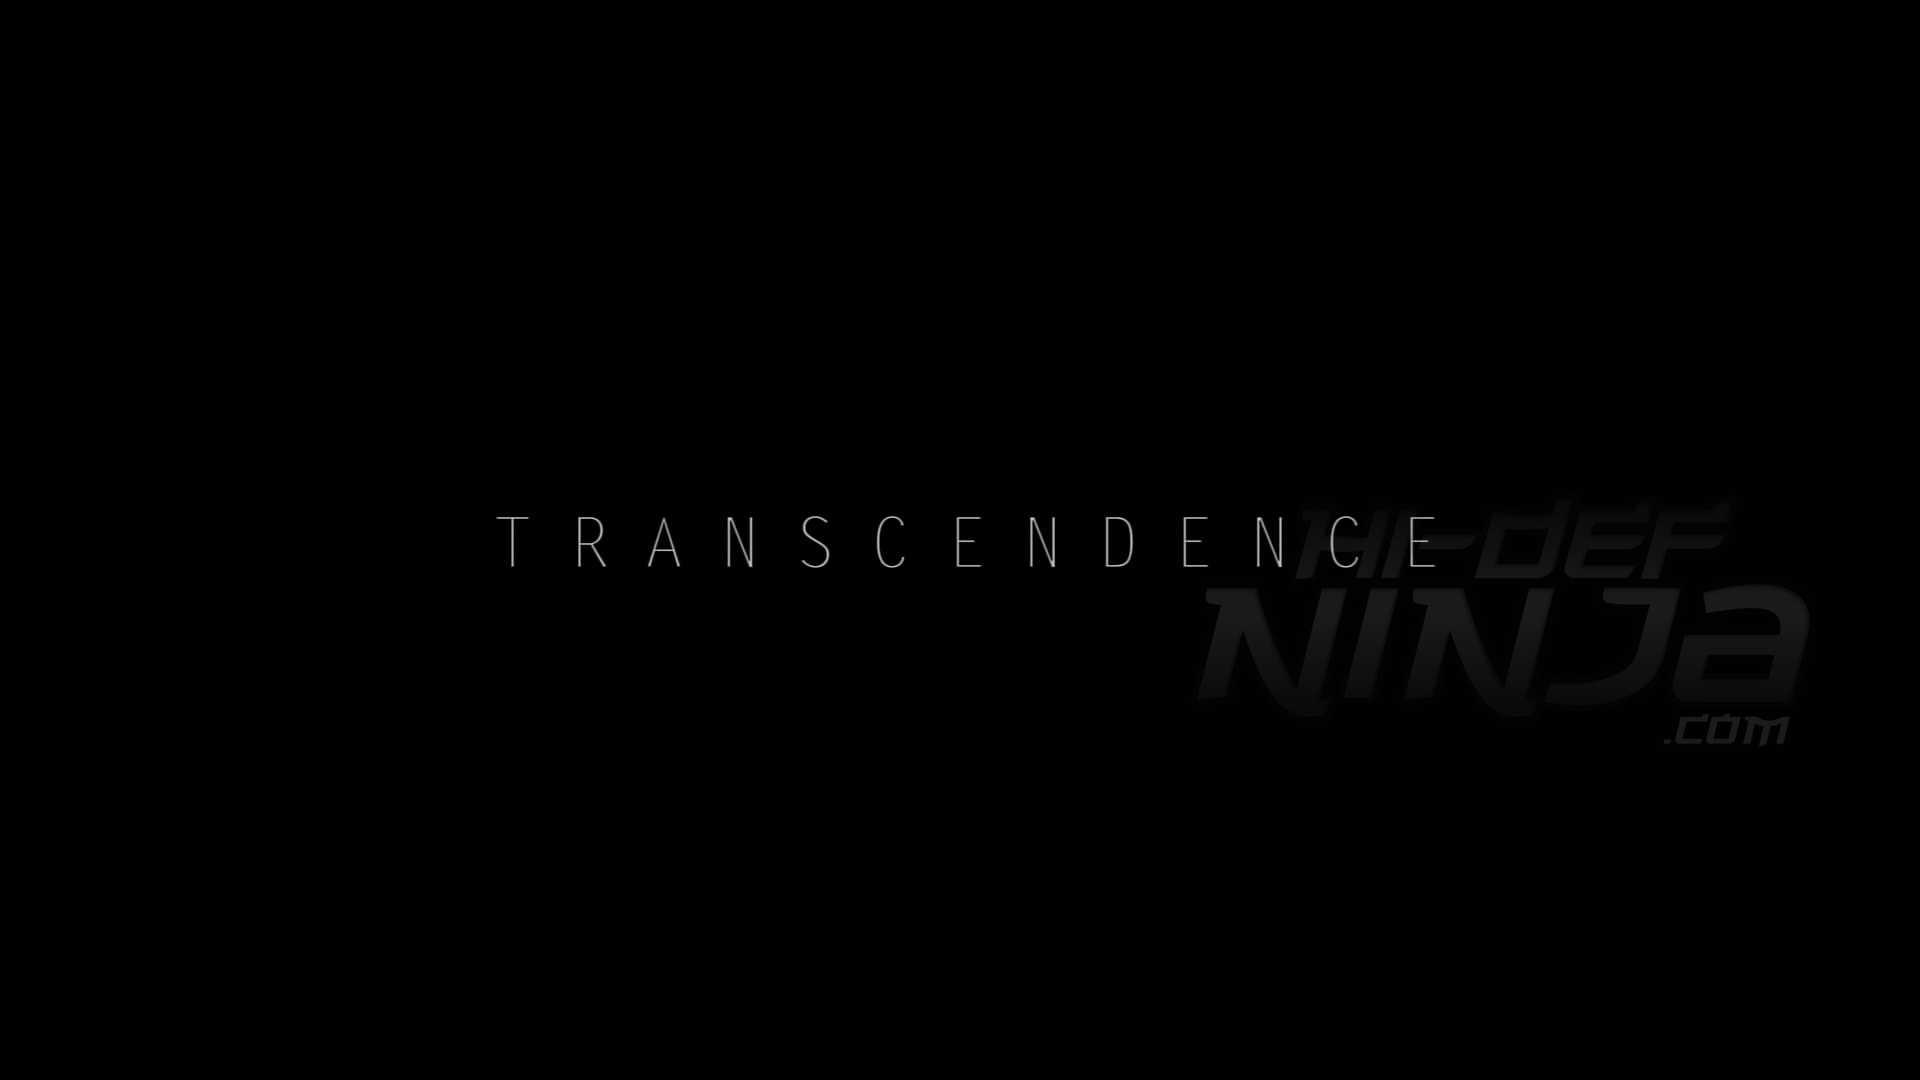 Transcendence-1